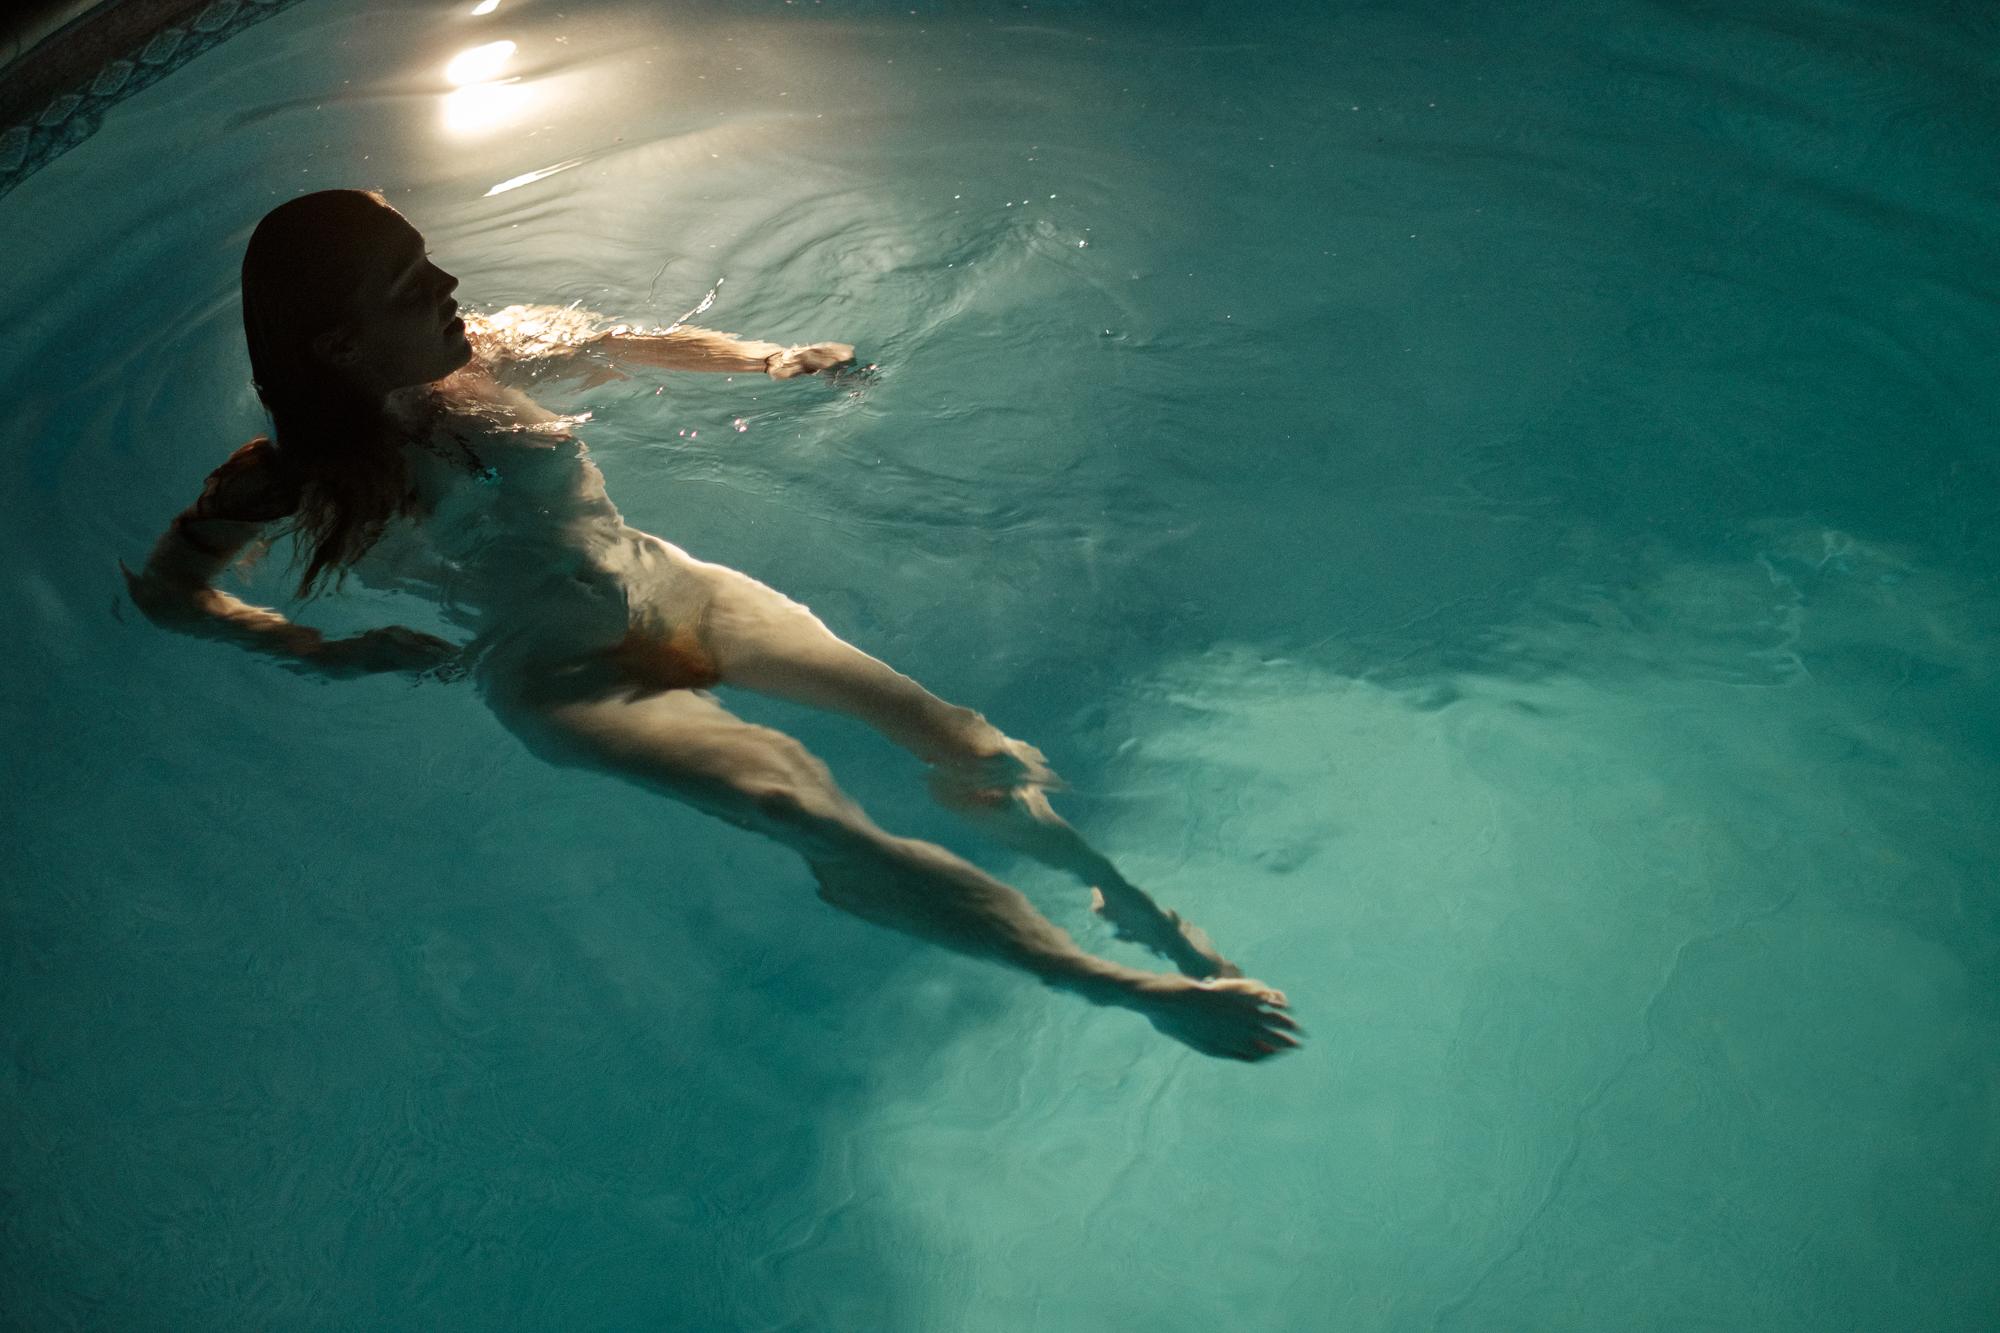 20170619-Ariane-Cassidy-Hannah-swimming-pool-X-Pro2-0110.jpg